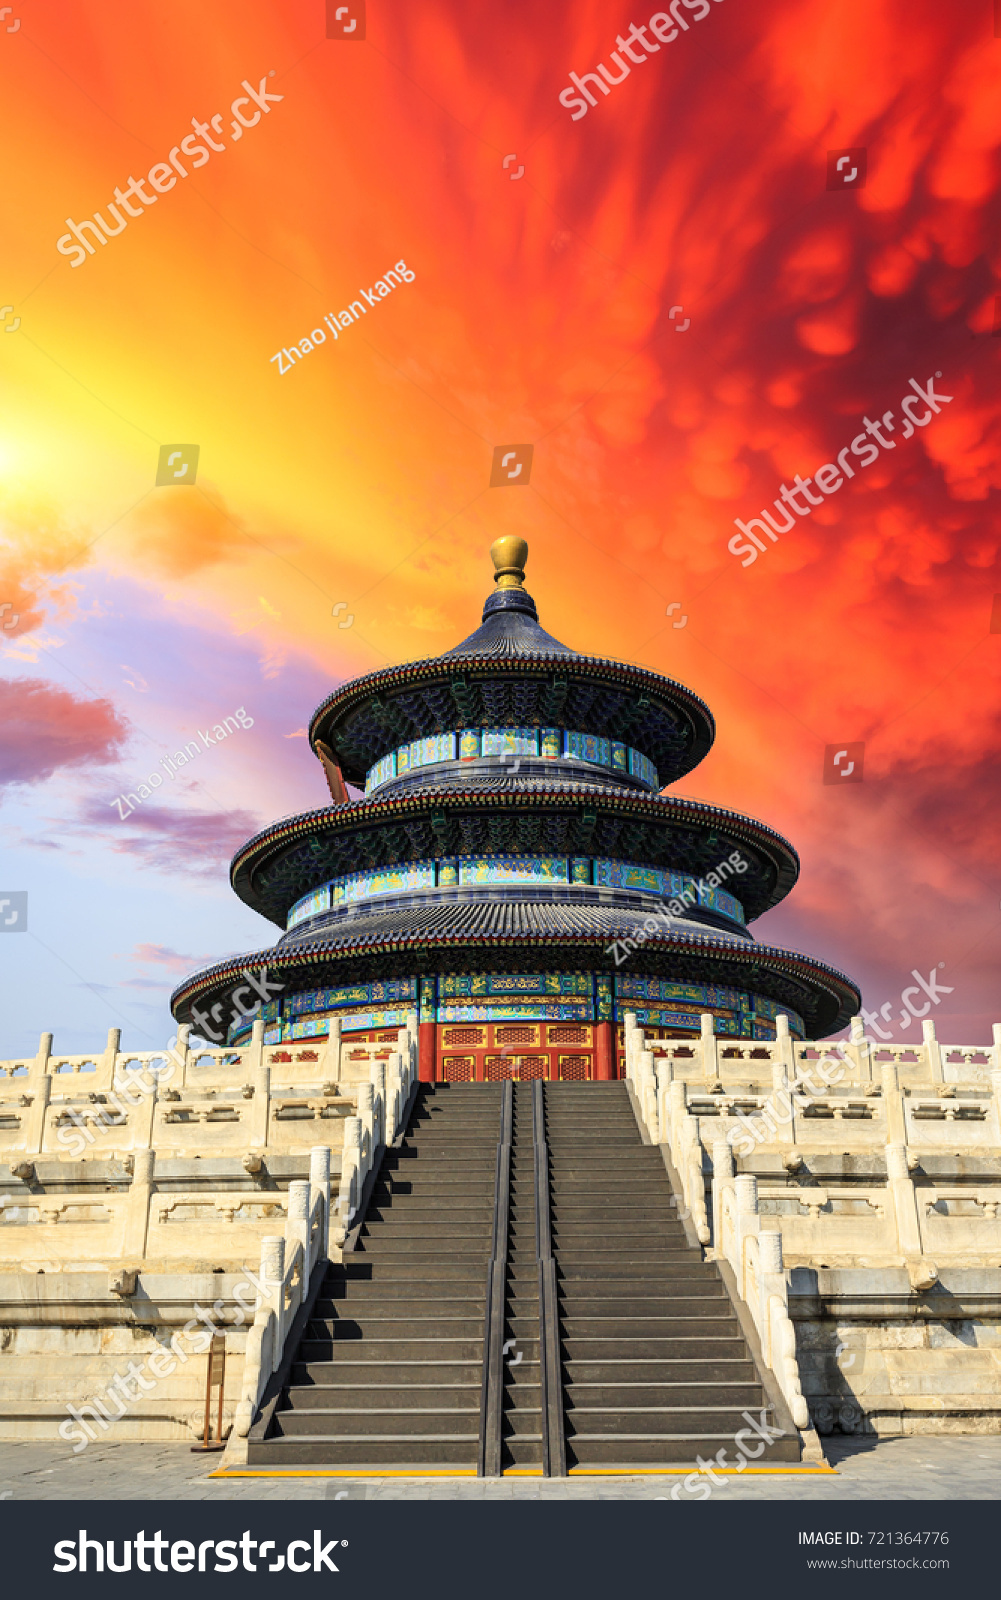 Temple heaven landscape sunset beijingchinese cultural stock photo temple of heaven landscape at sunset in beijingchinese cultural symbols biocorpaavc Gallery